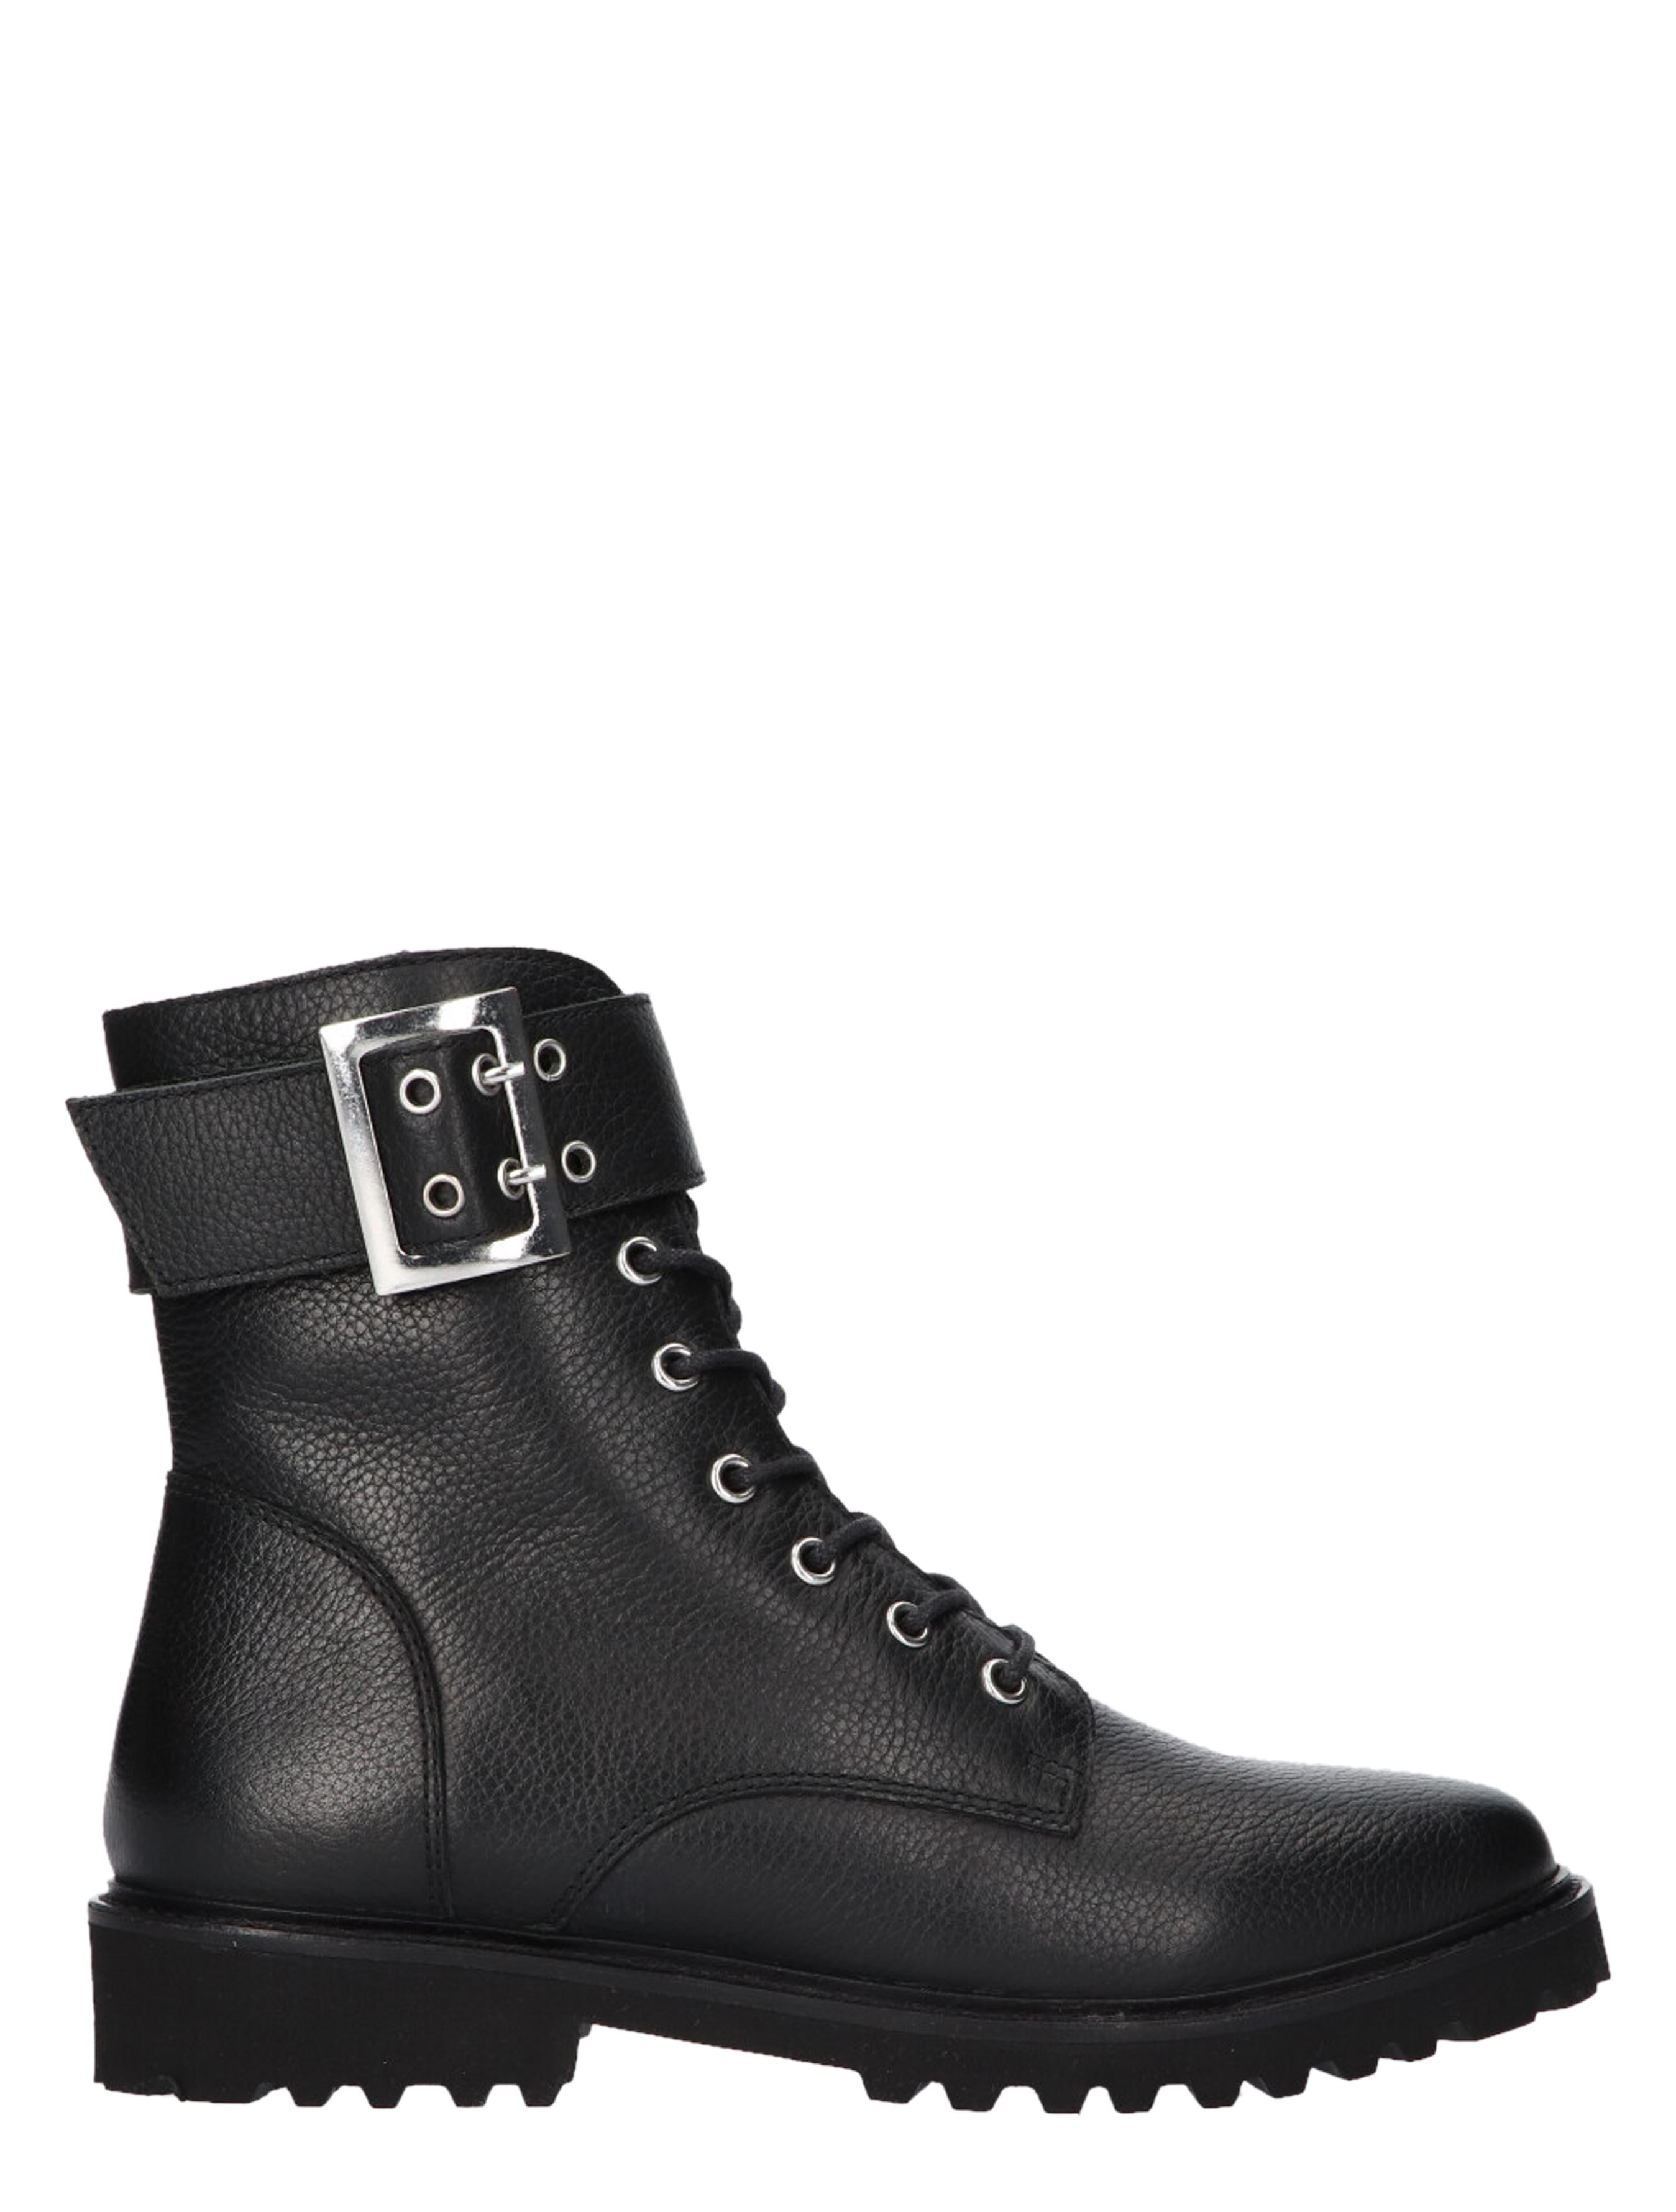 Tango Bee 524-f Black Biker boots